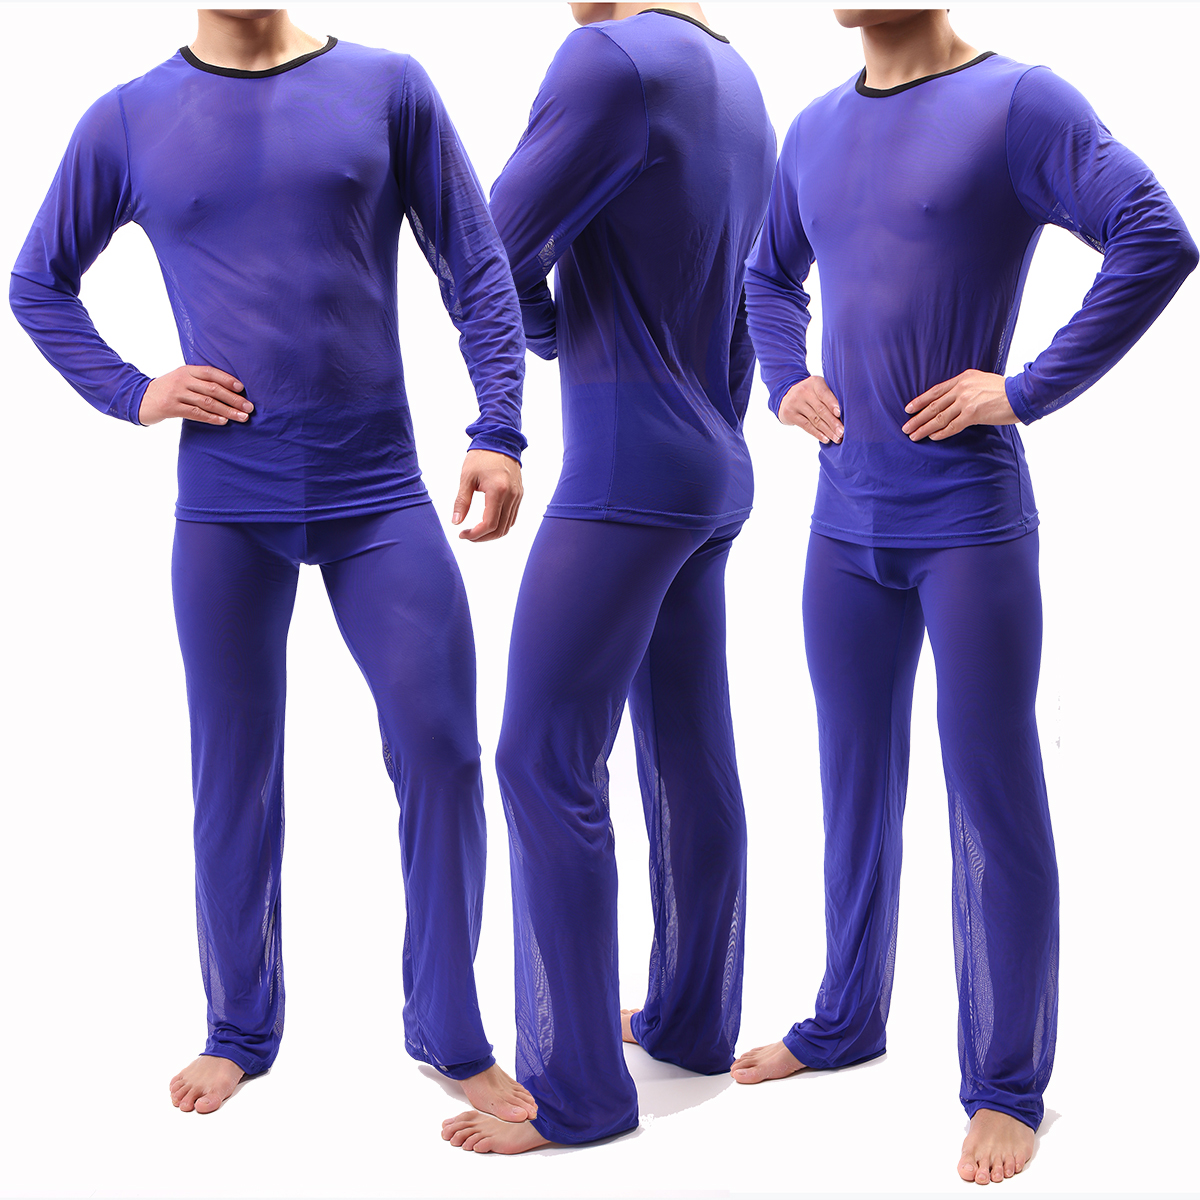 Sexy Men Pajamas Sets See Through Ice Silk T-shirts No Seaming Tee Thin Man T-shirt & Pants Pajama Sexy Male Pajamas Sleepwear